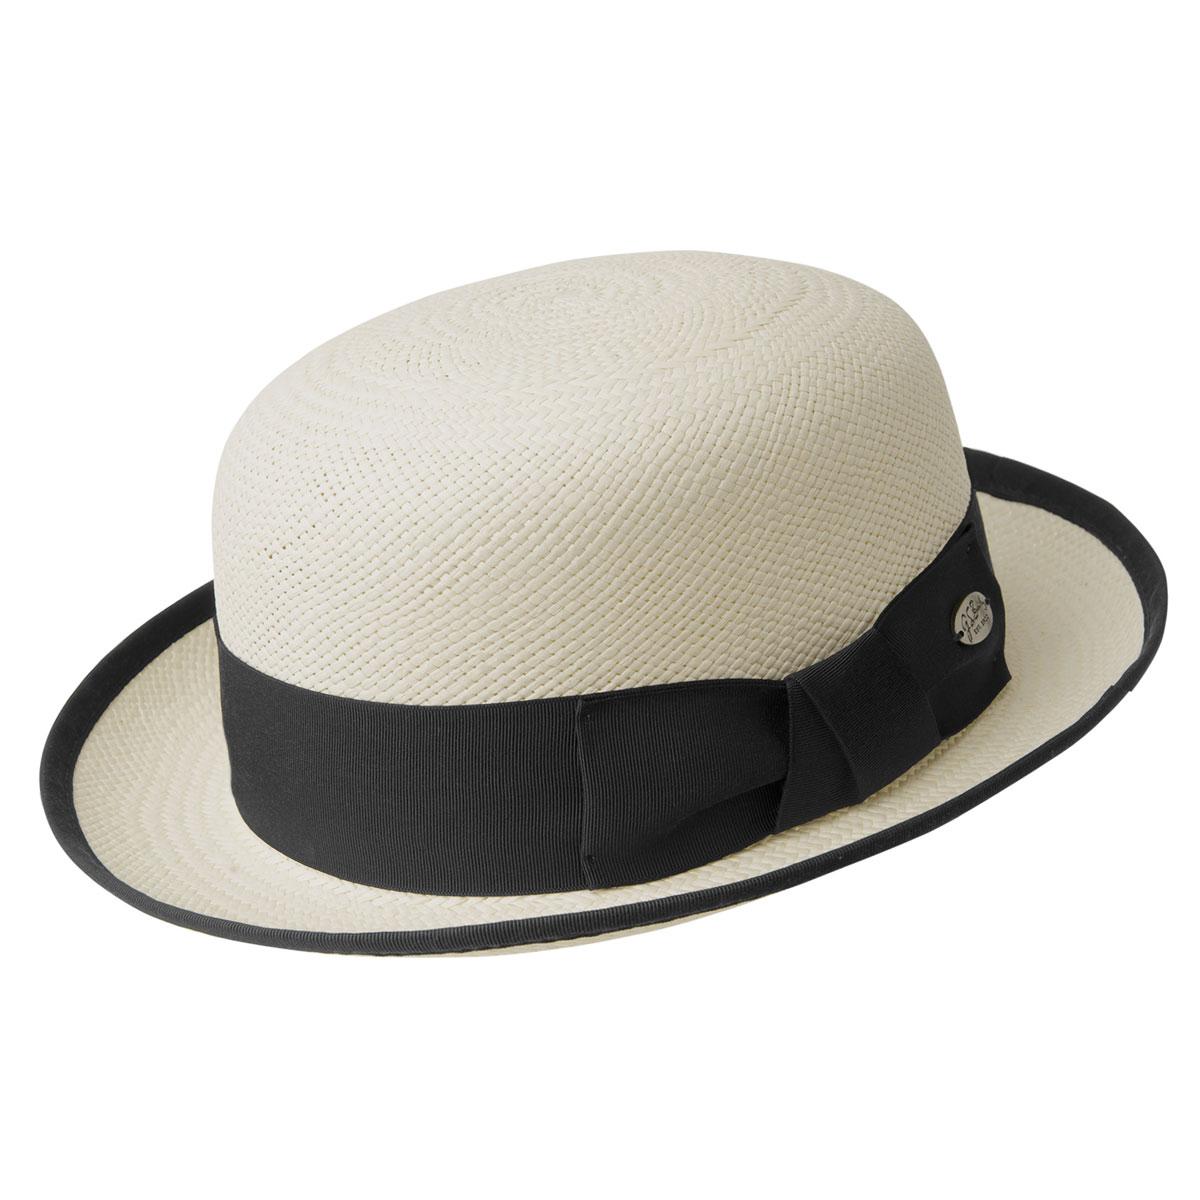 1920s Mens Hats & Caps | Gatsby, Peaky Blinders, Gangster Chaplin Panama Bowler $175.00 AT vintagedancer.com